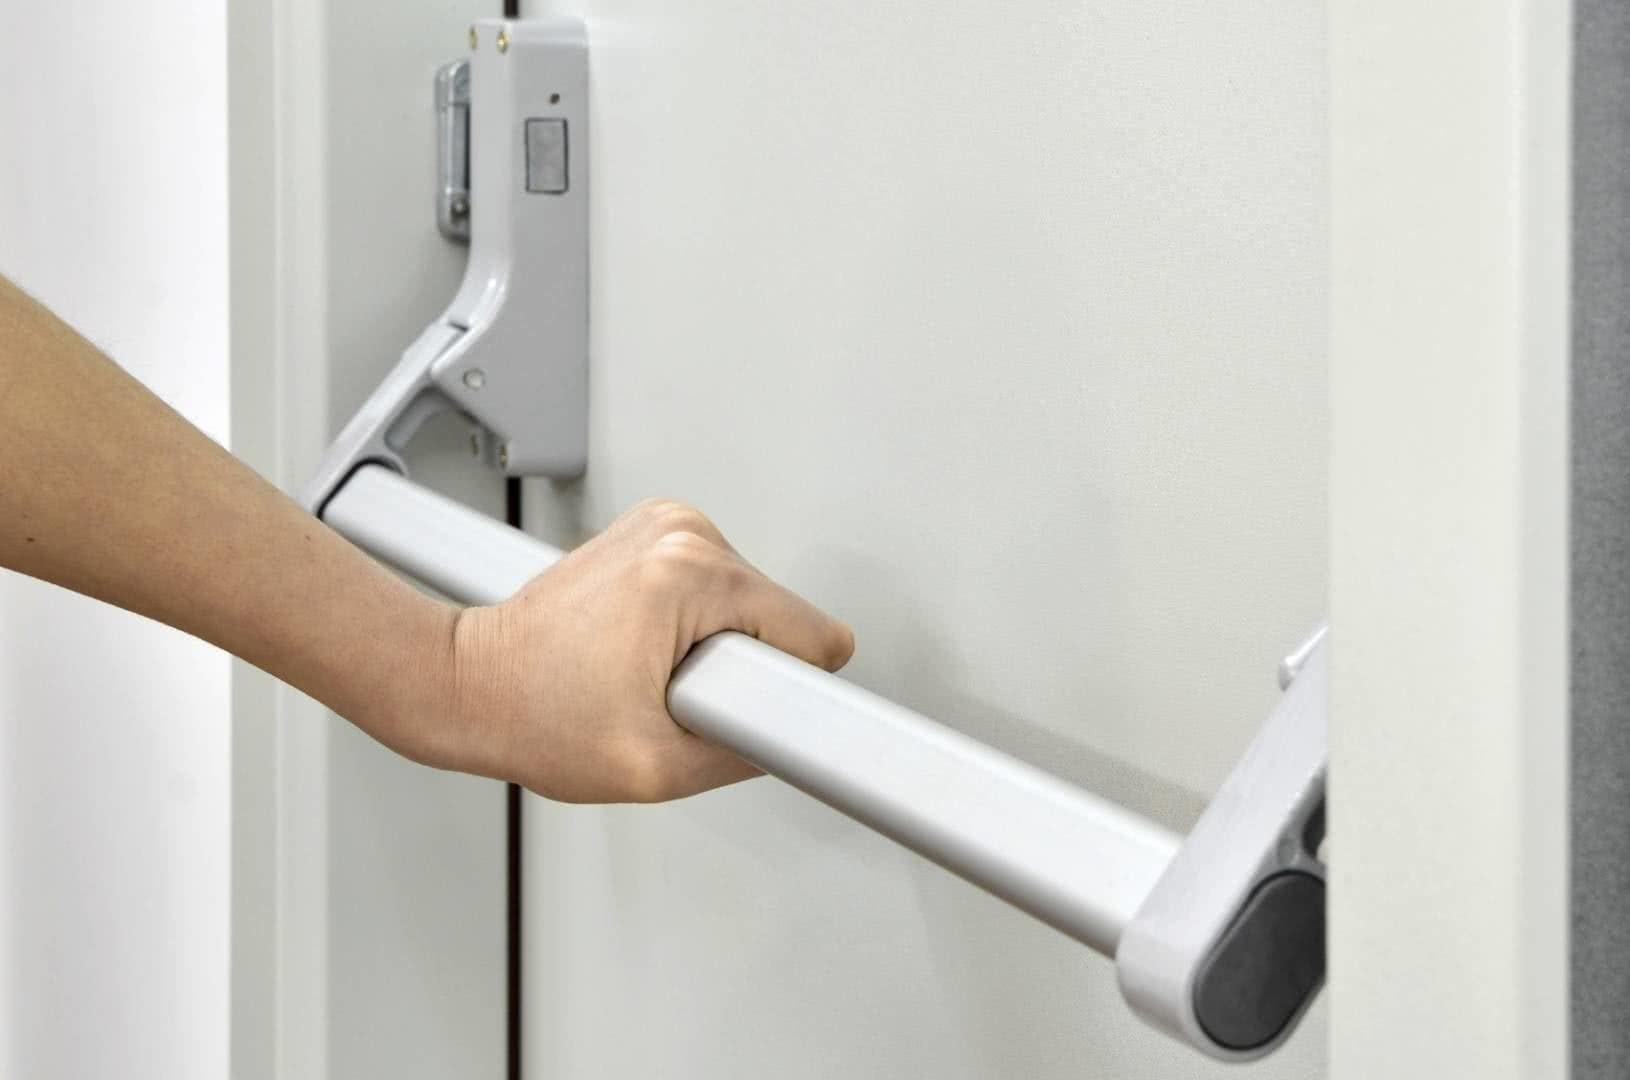 Sistemes de seguretat passiva